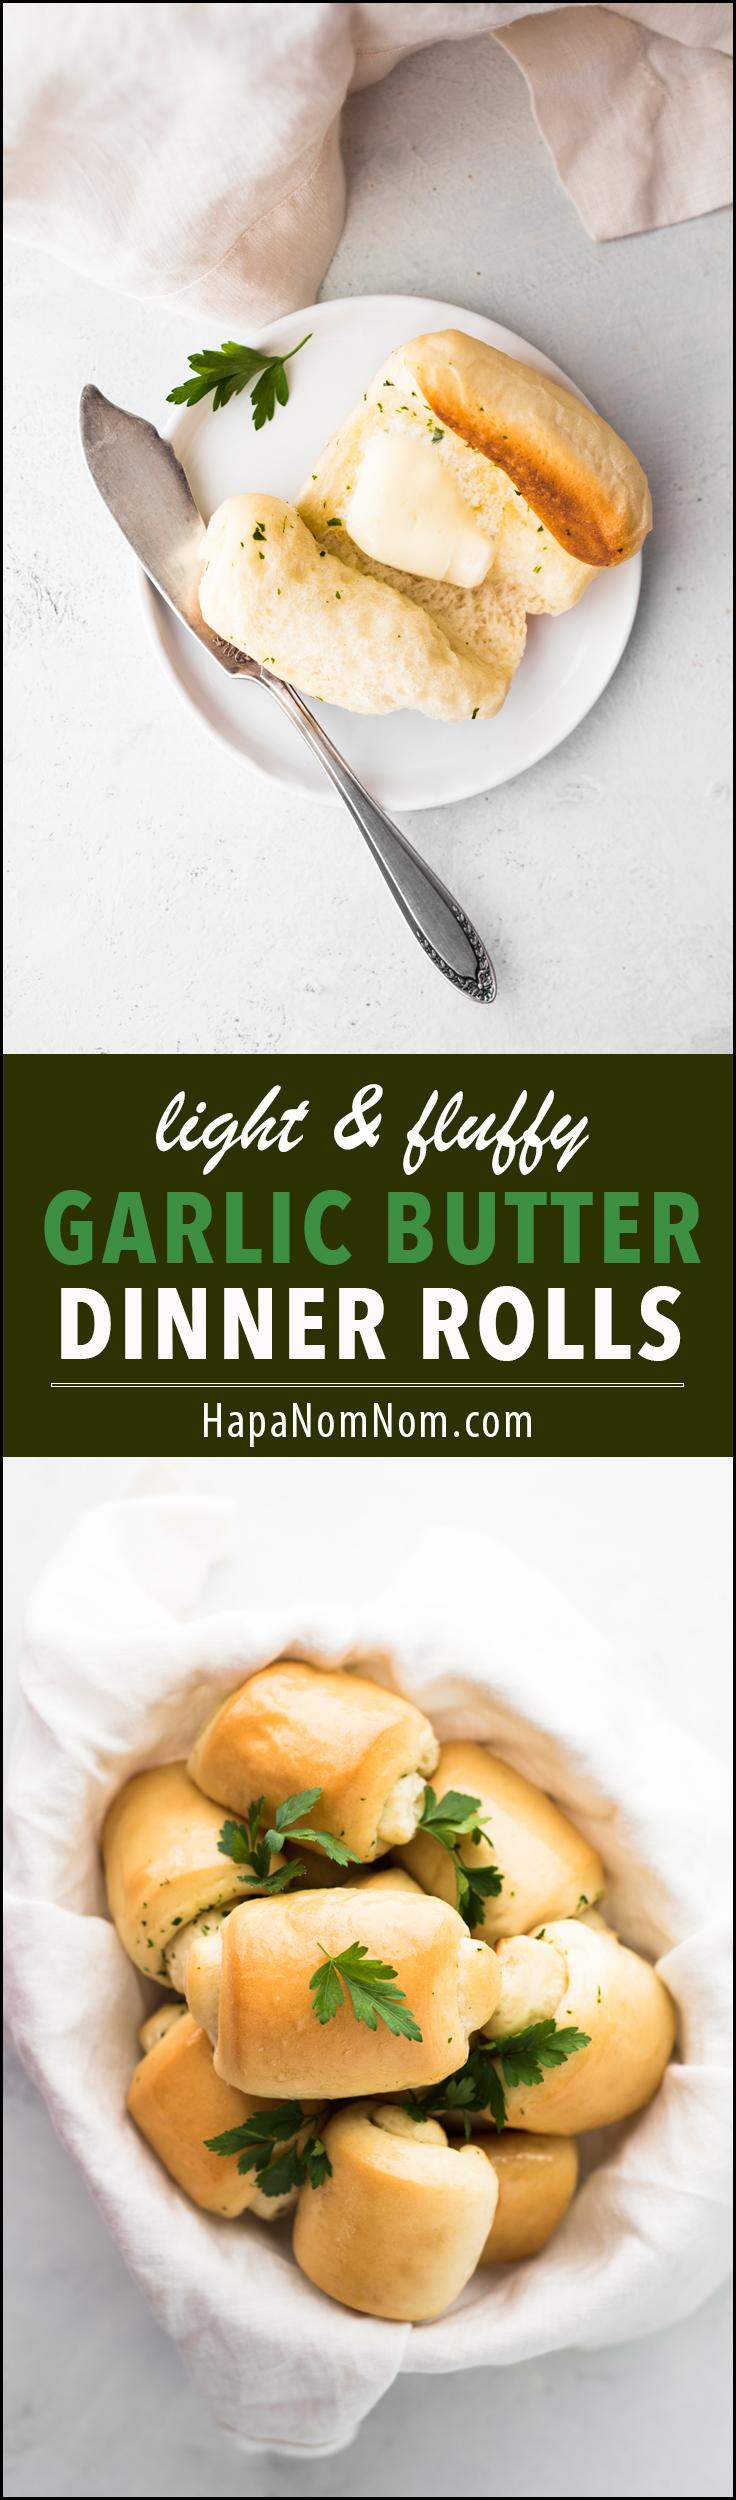 Incredibly light and fluffy Garlic Butter Dinner Rolls